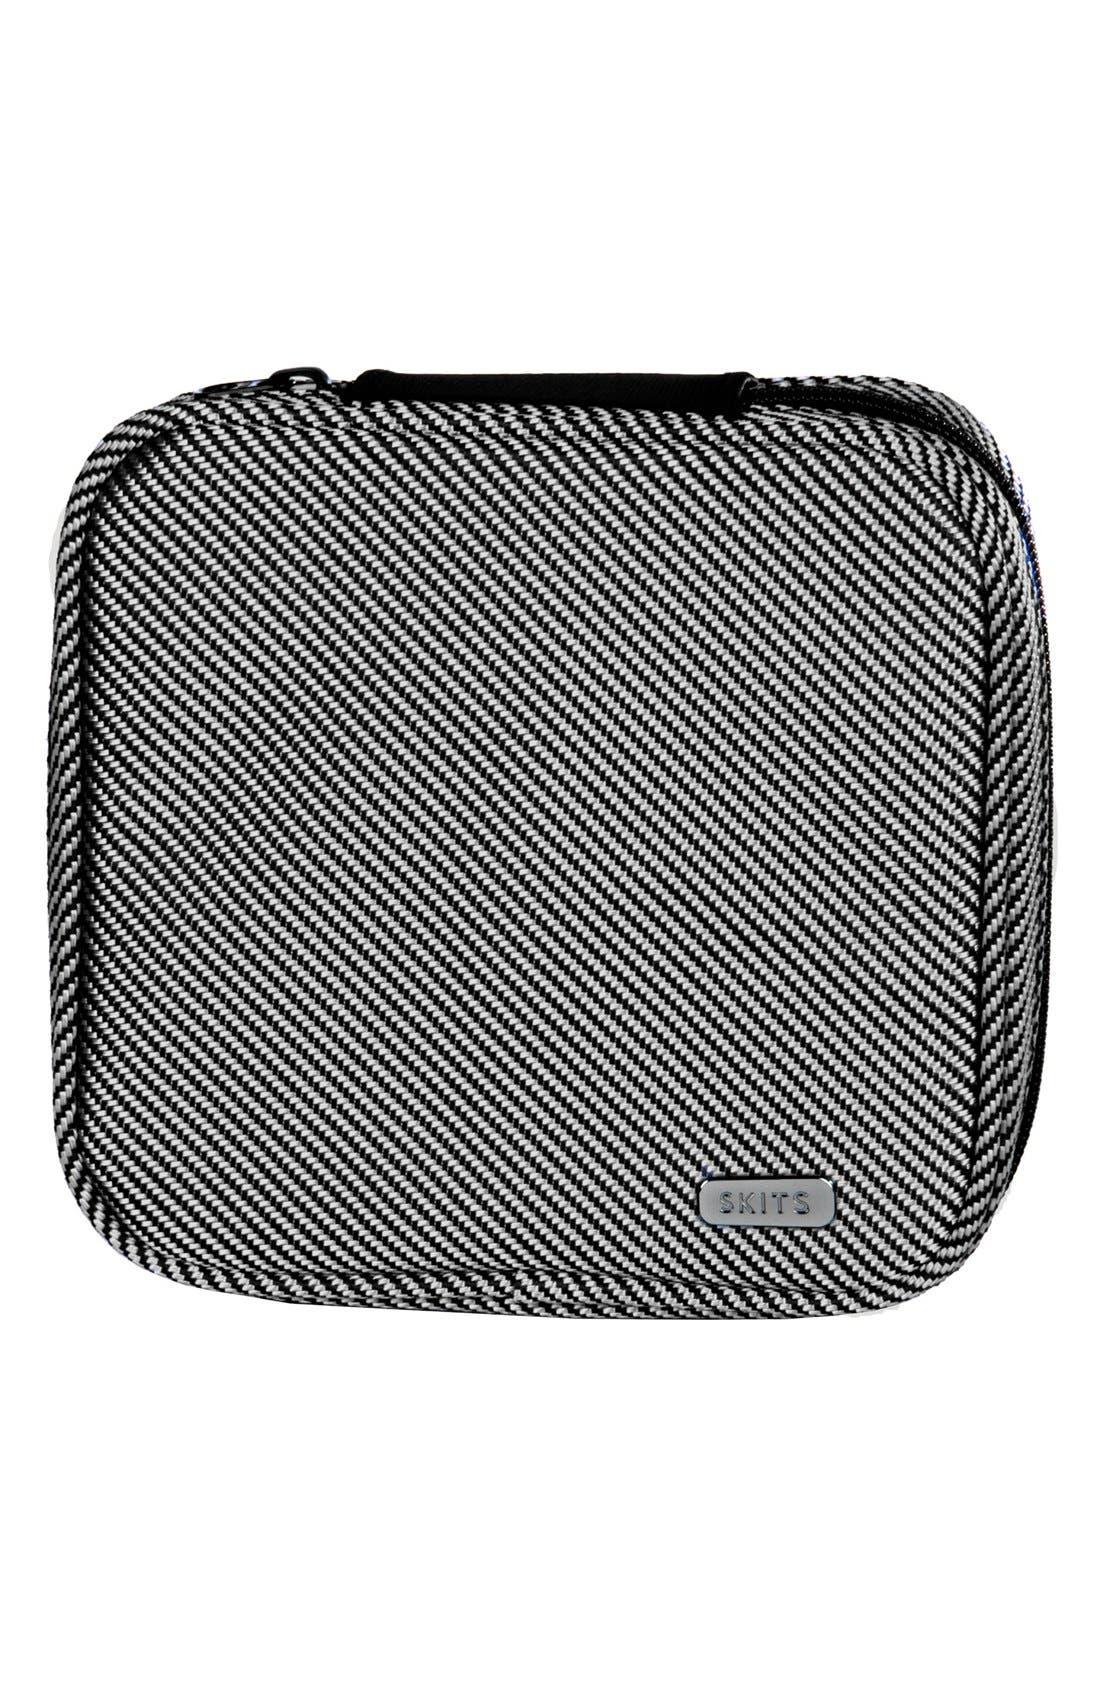 SKITS Smart Carbon Stripe Tech Case